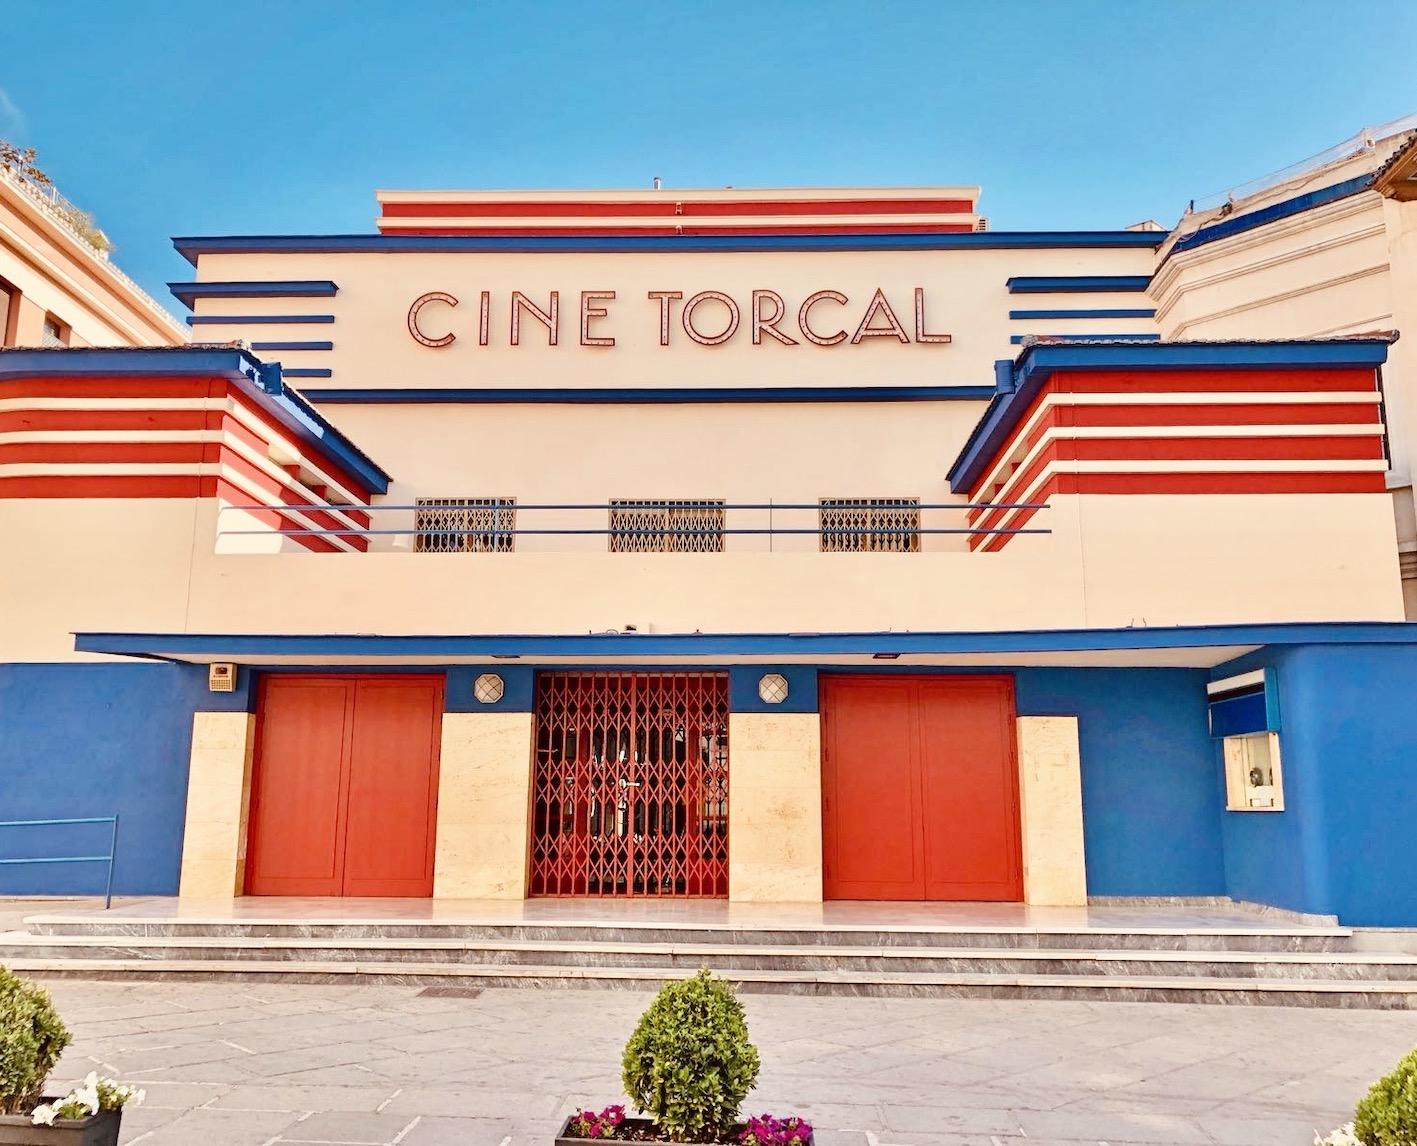 Cinema Torcal Antequera Spain..